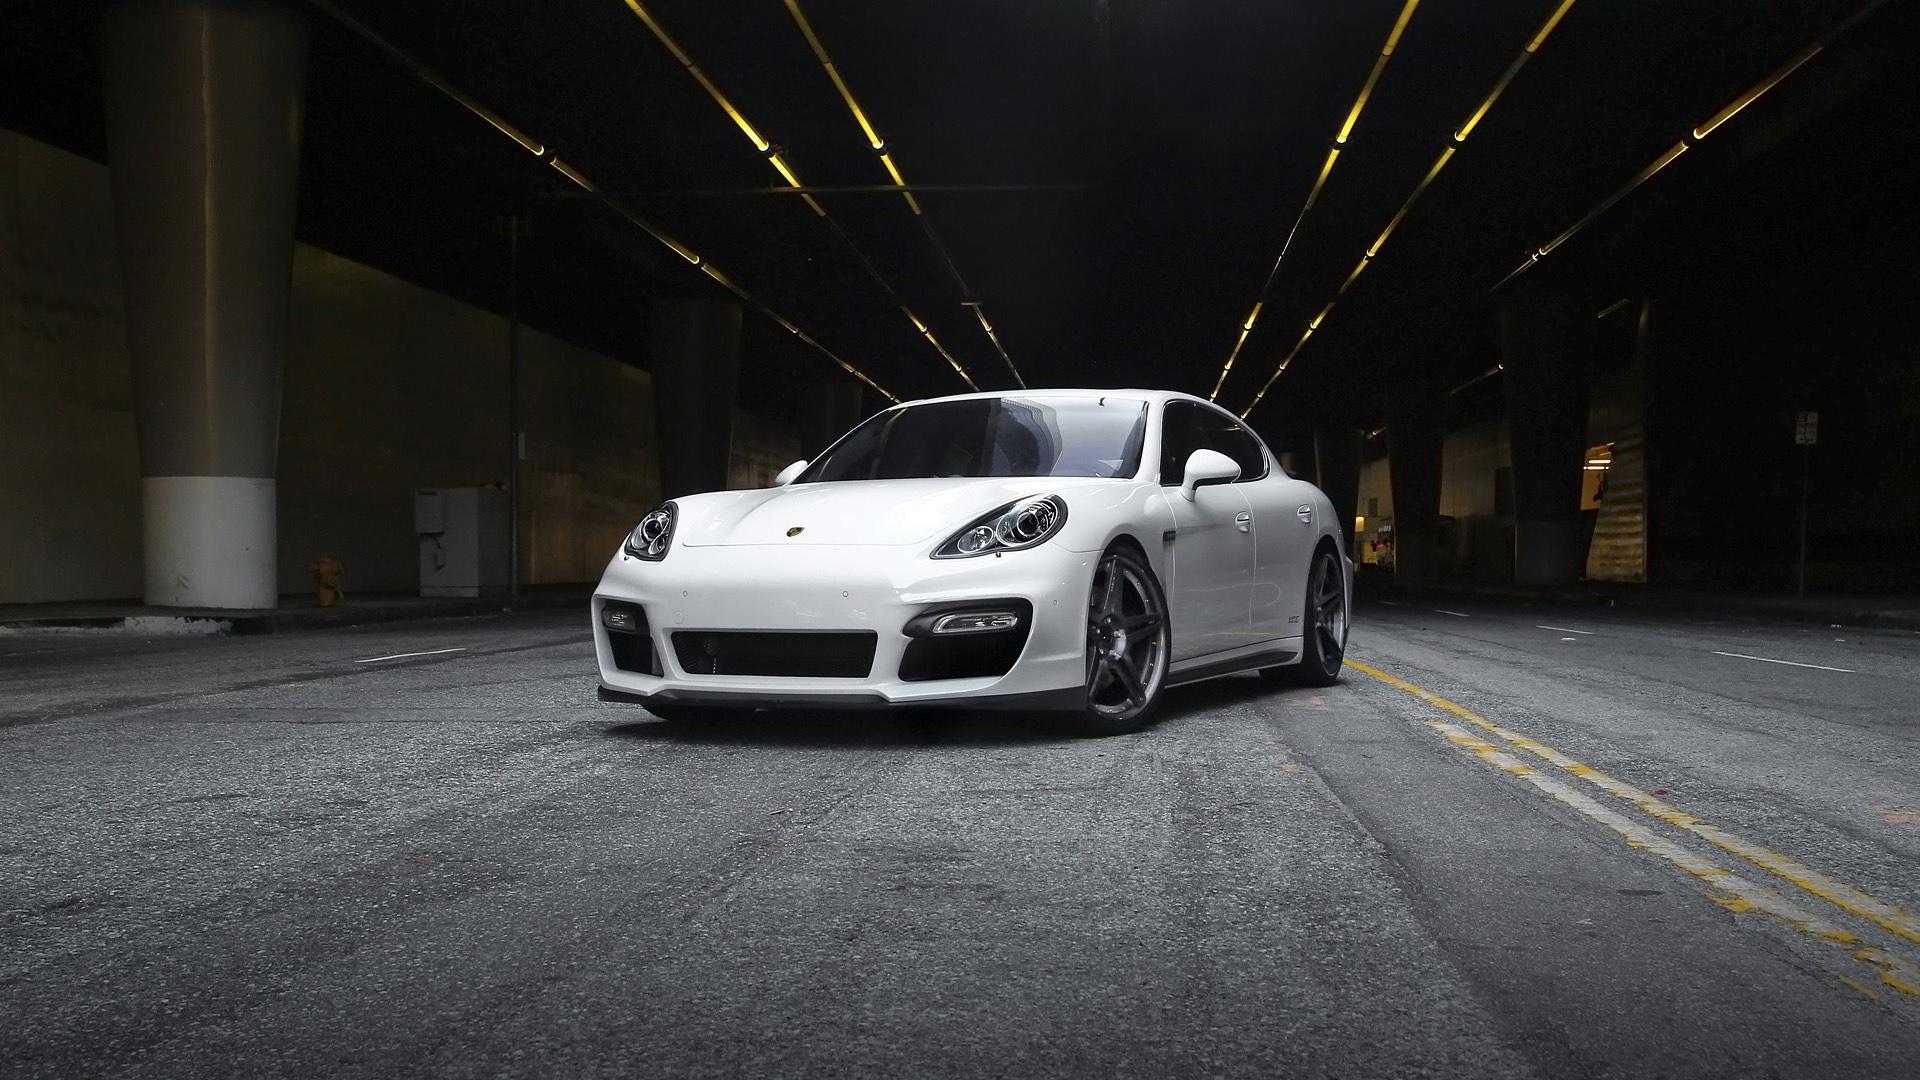 Beautiful Space 3d Live Wallpaper And Screensaver Porsche Panamera Desktop Download Hd Desktop Wallpapers